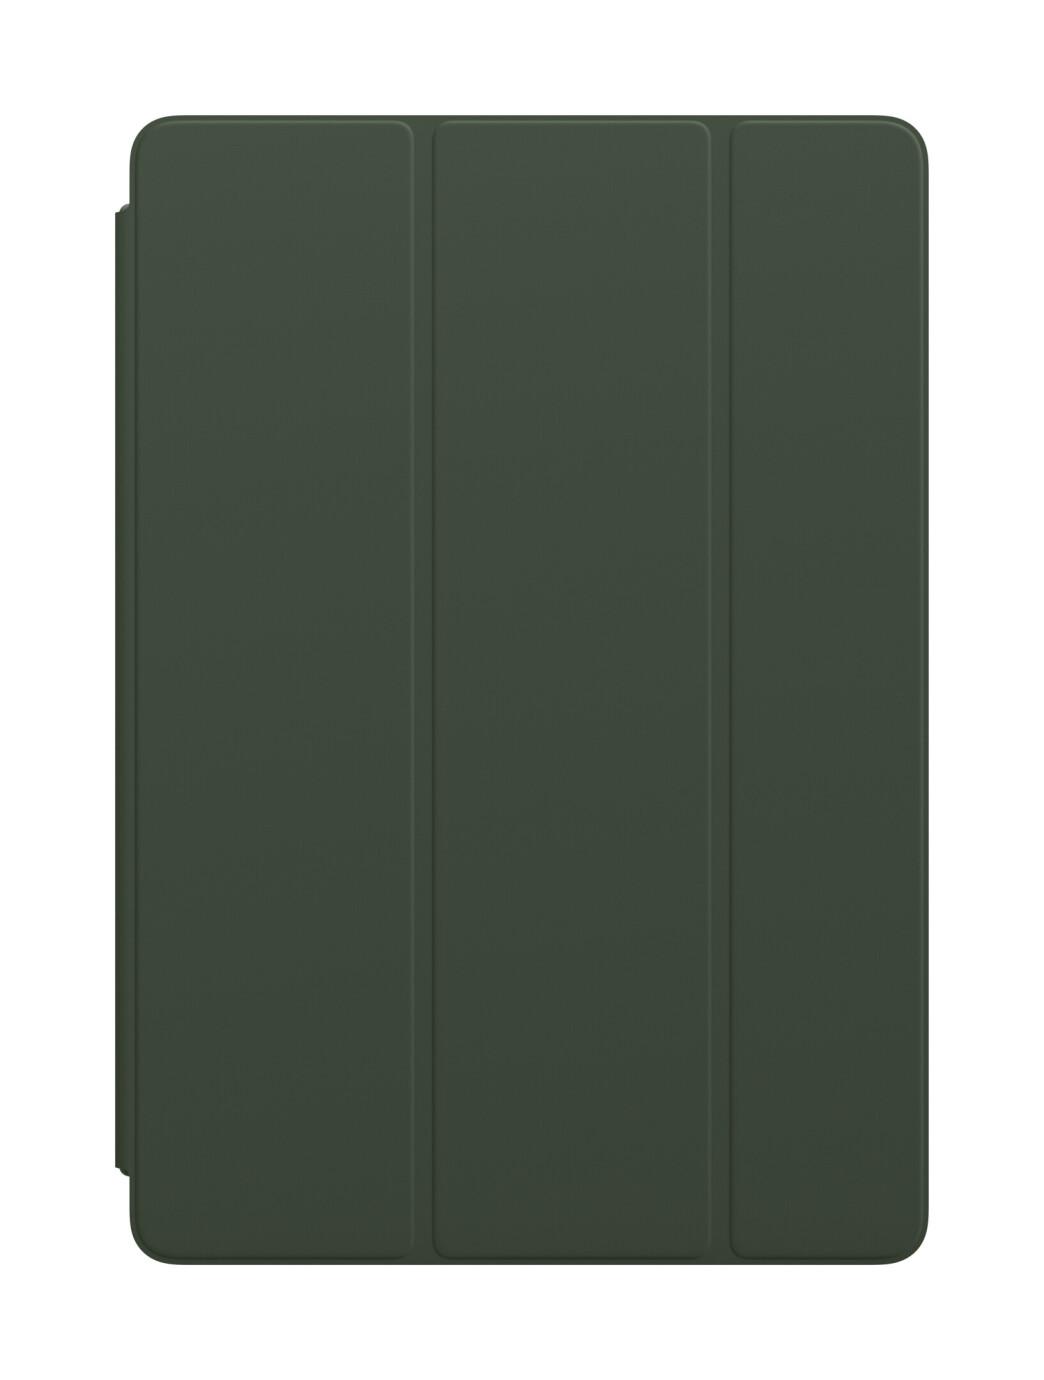 Apple Smart Cover für iPad mini (4+5. Generation) - Zyperngrün